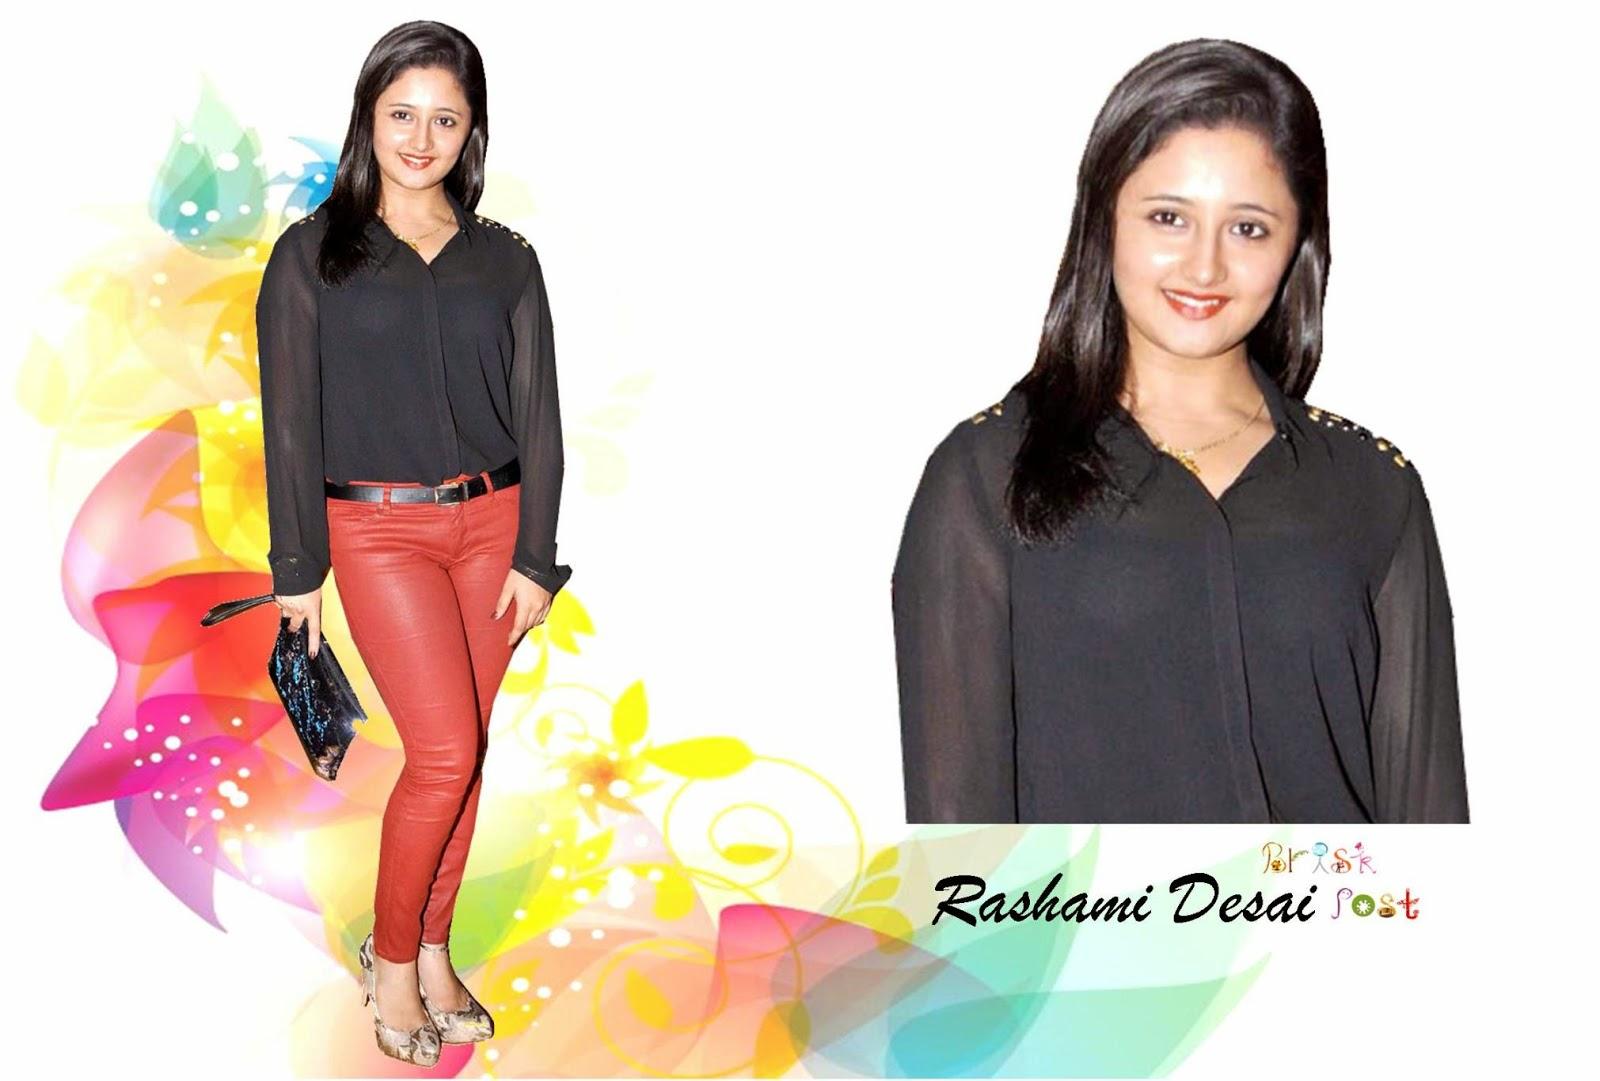 Rashami Desai Wallpaper